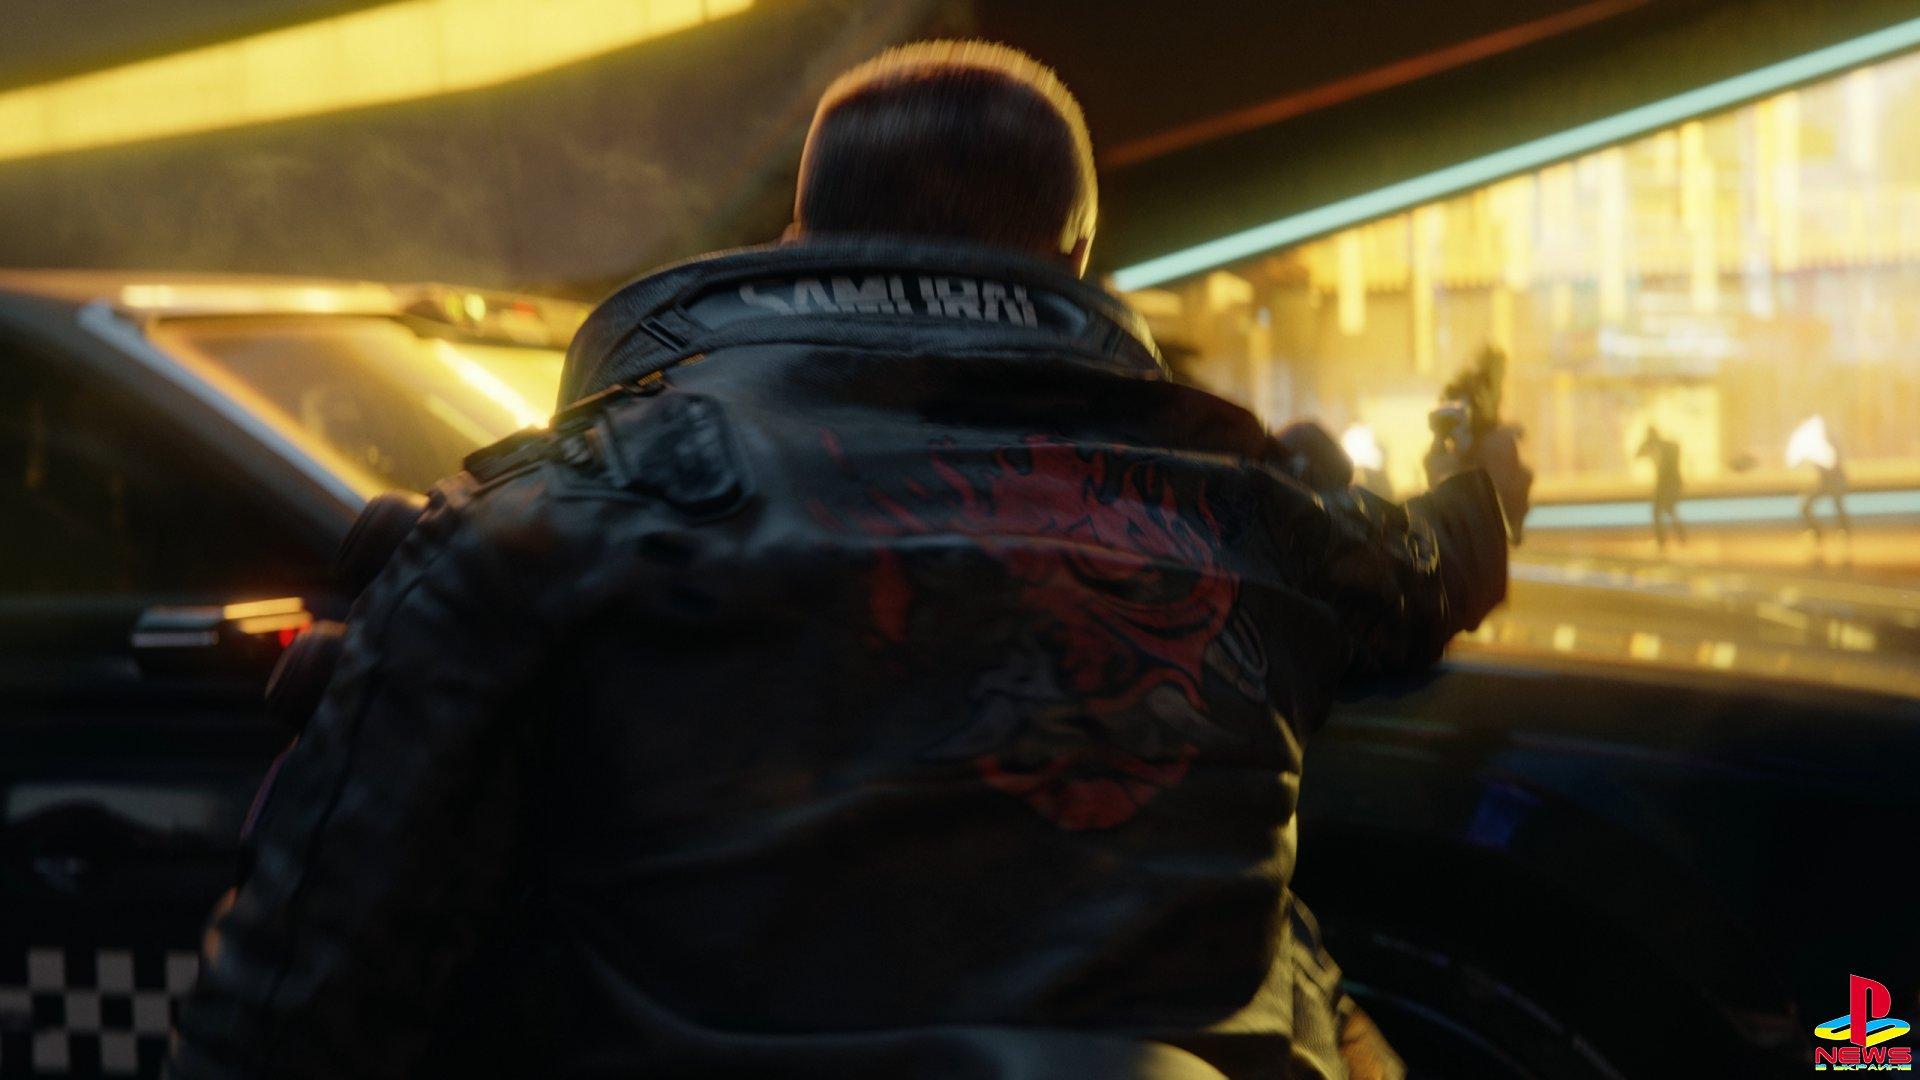 Cyberpunk 2077 ждут высокие продажи? Аналитики составили прогноз на ближайш ...